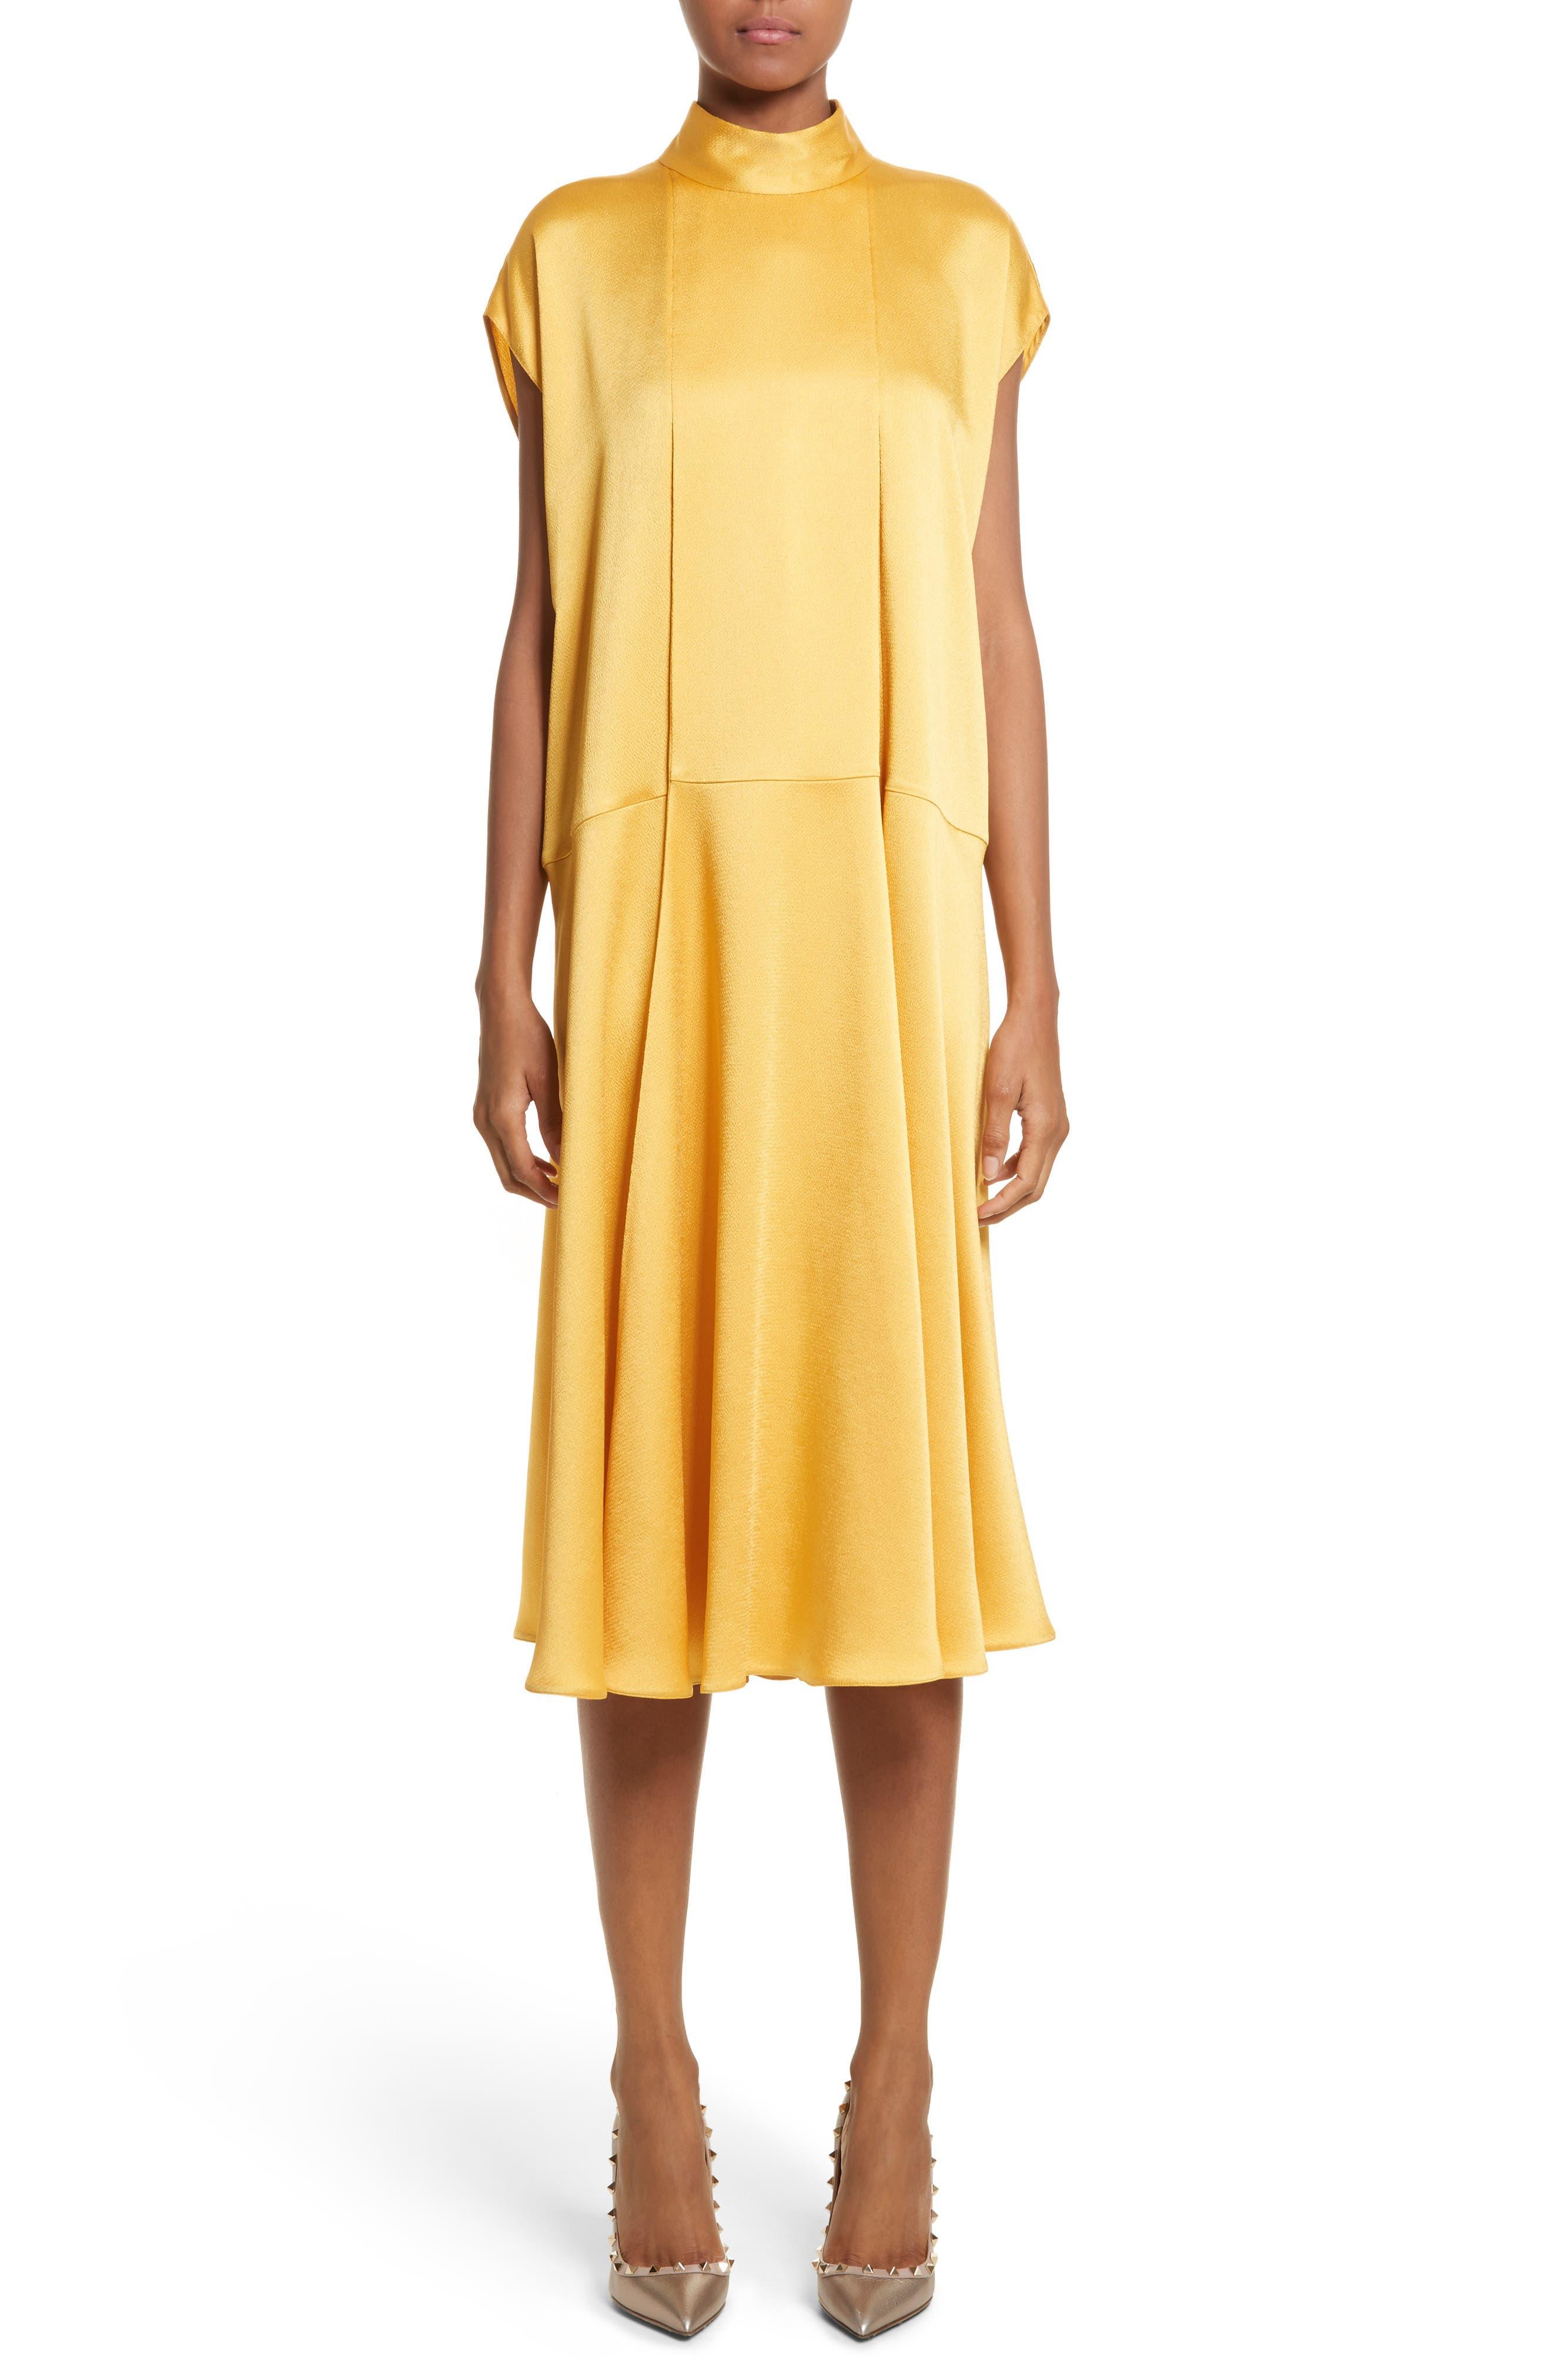 Hammered Satin Midi Dress,                         Main,                         color, Canary Yellow